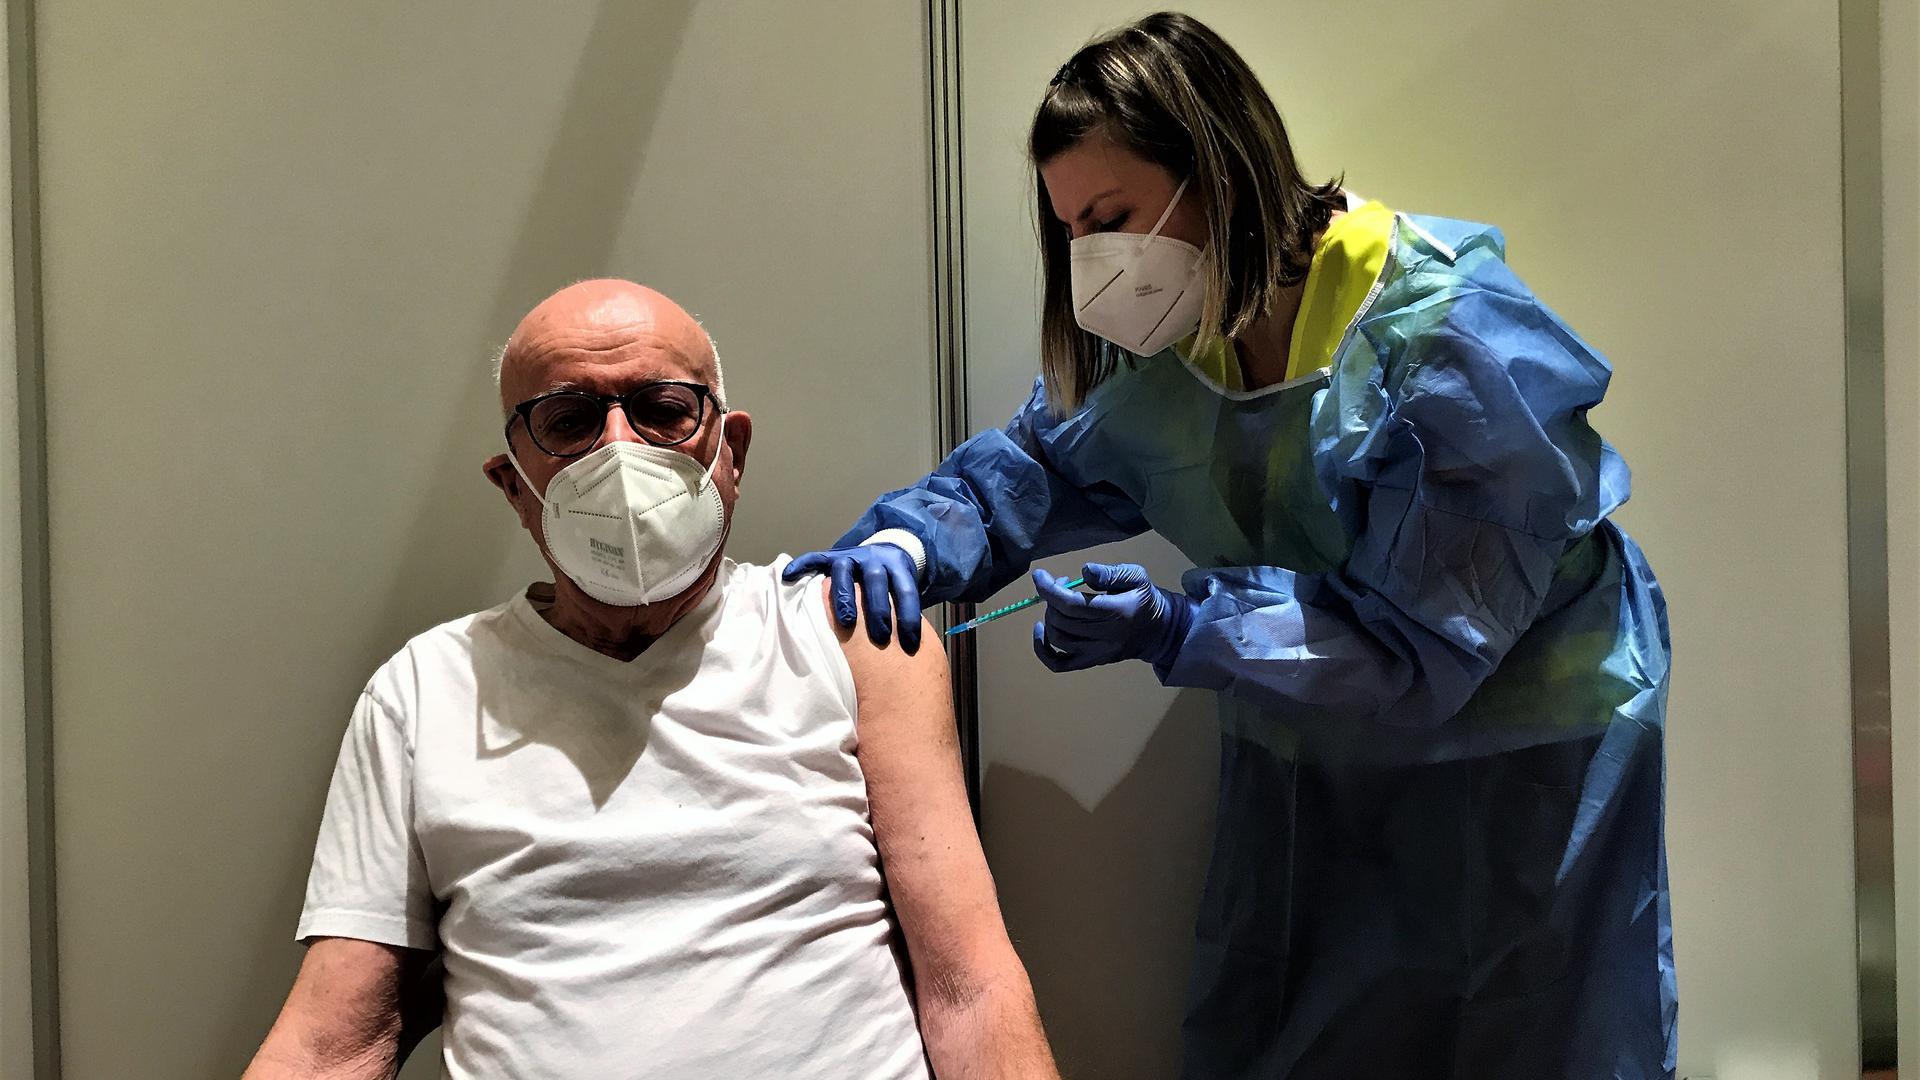 Fatma Consolino verpasst Hans-Joachim Lehmann im Impfzentrum des Kurhauses Baden-Baden den Covid-19-Schutz.